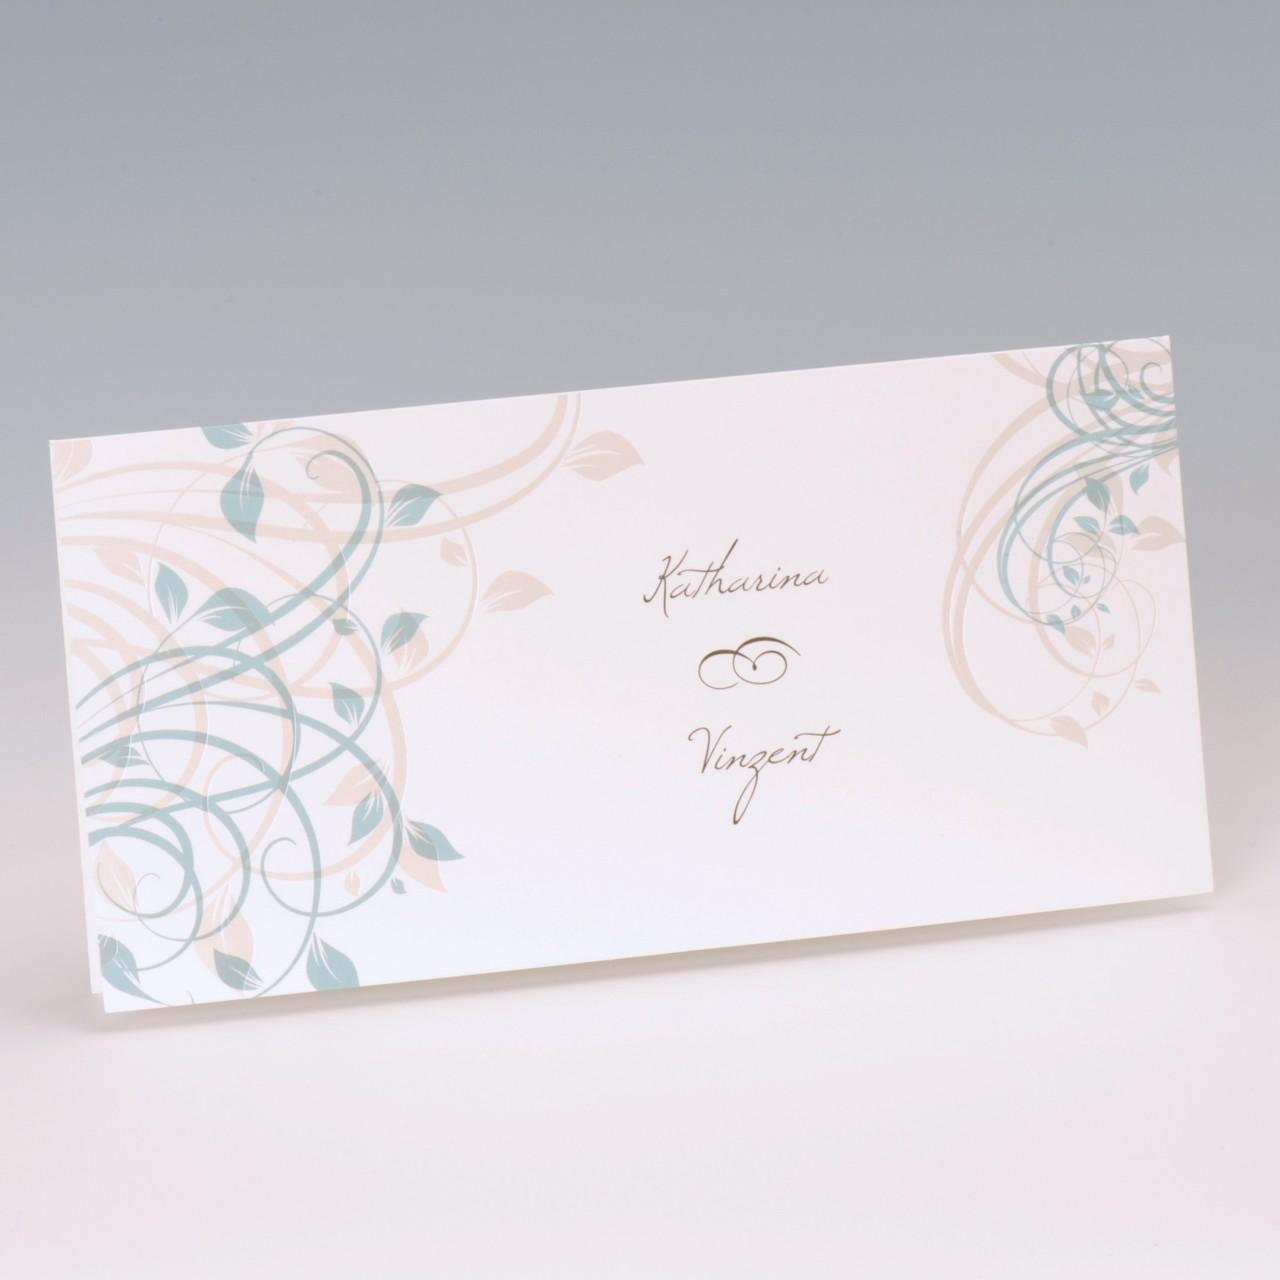 Einladungskarte - H 1934